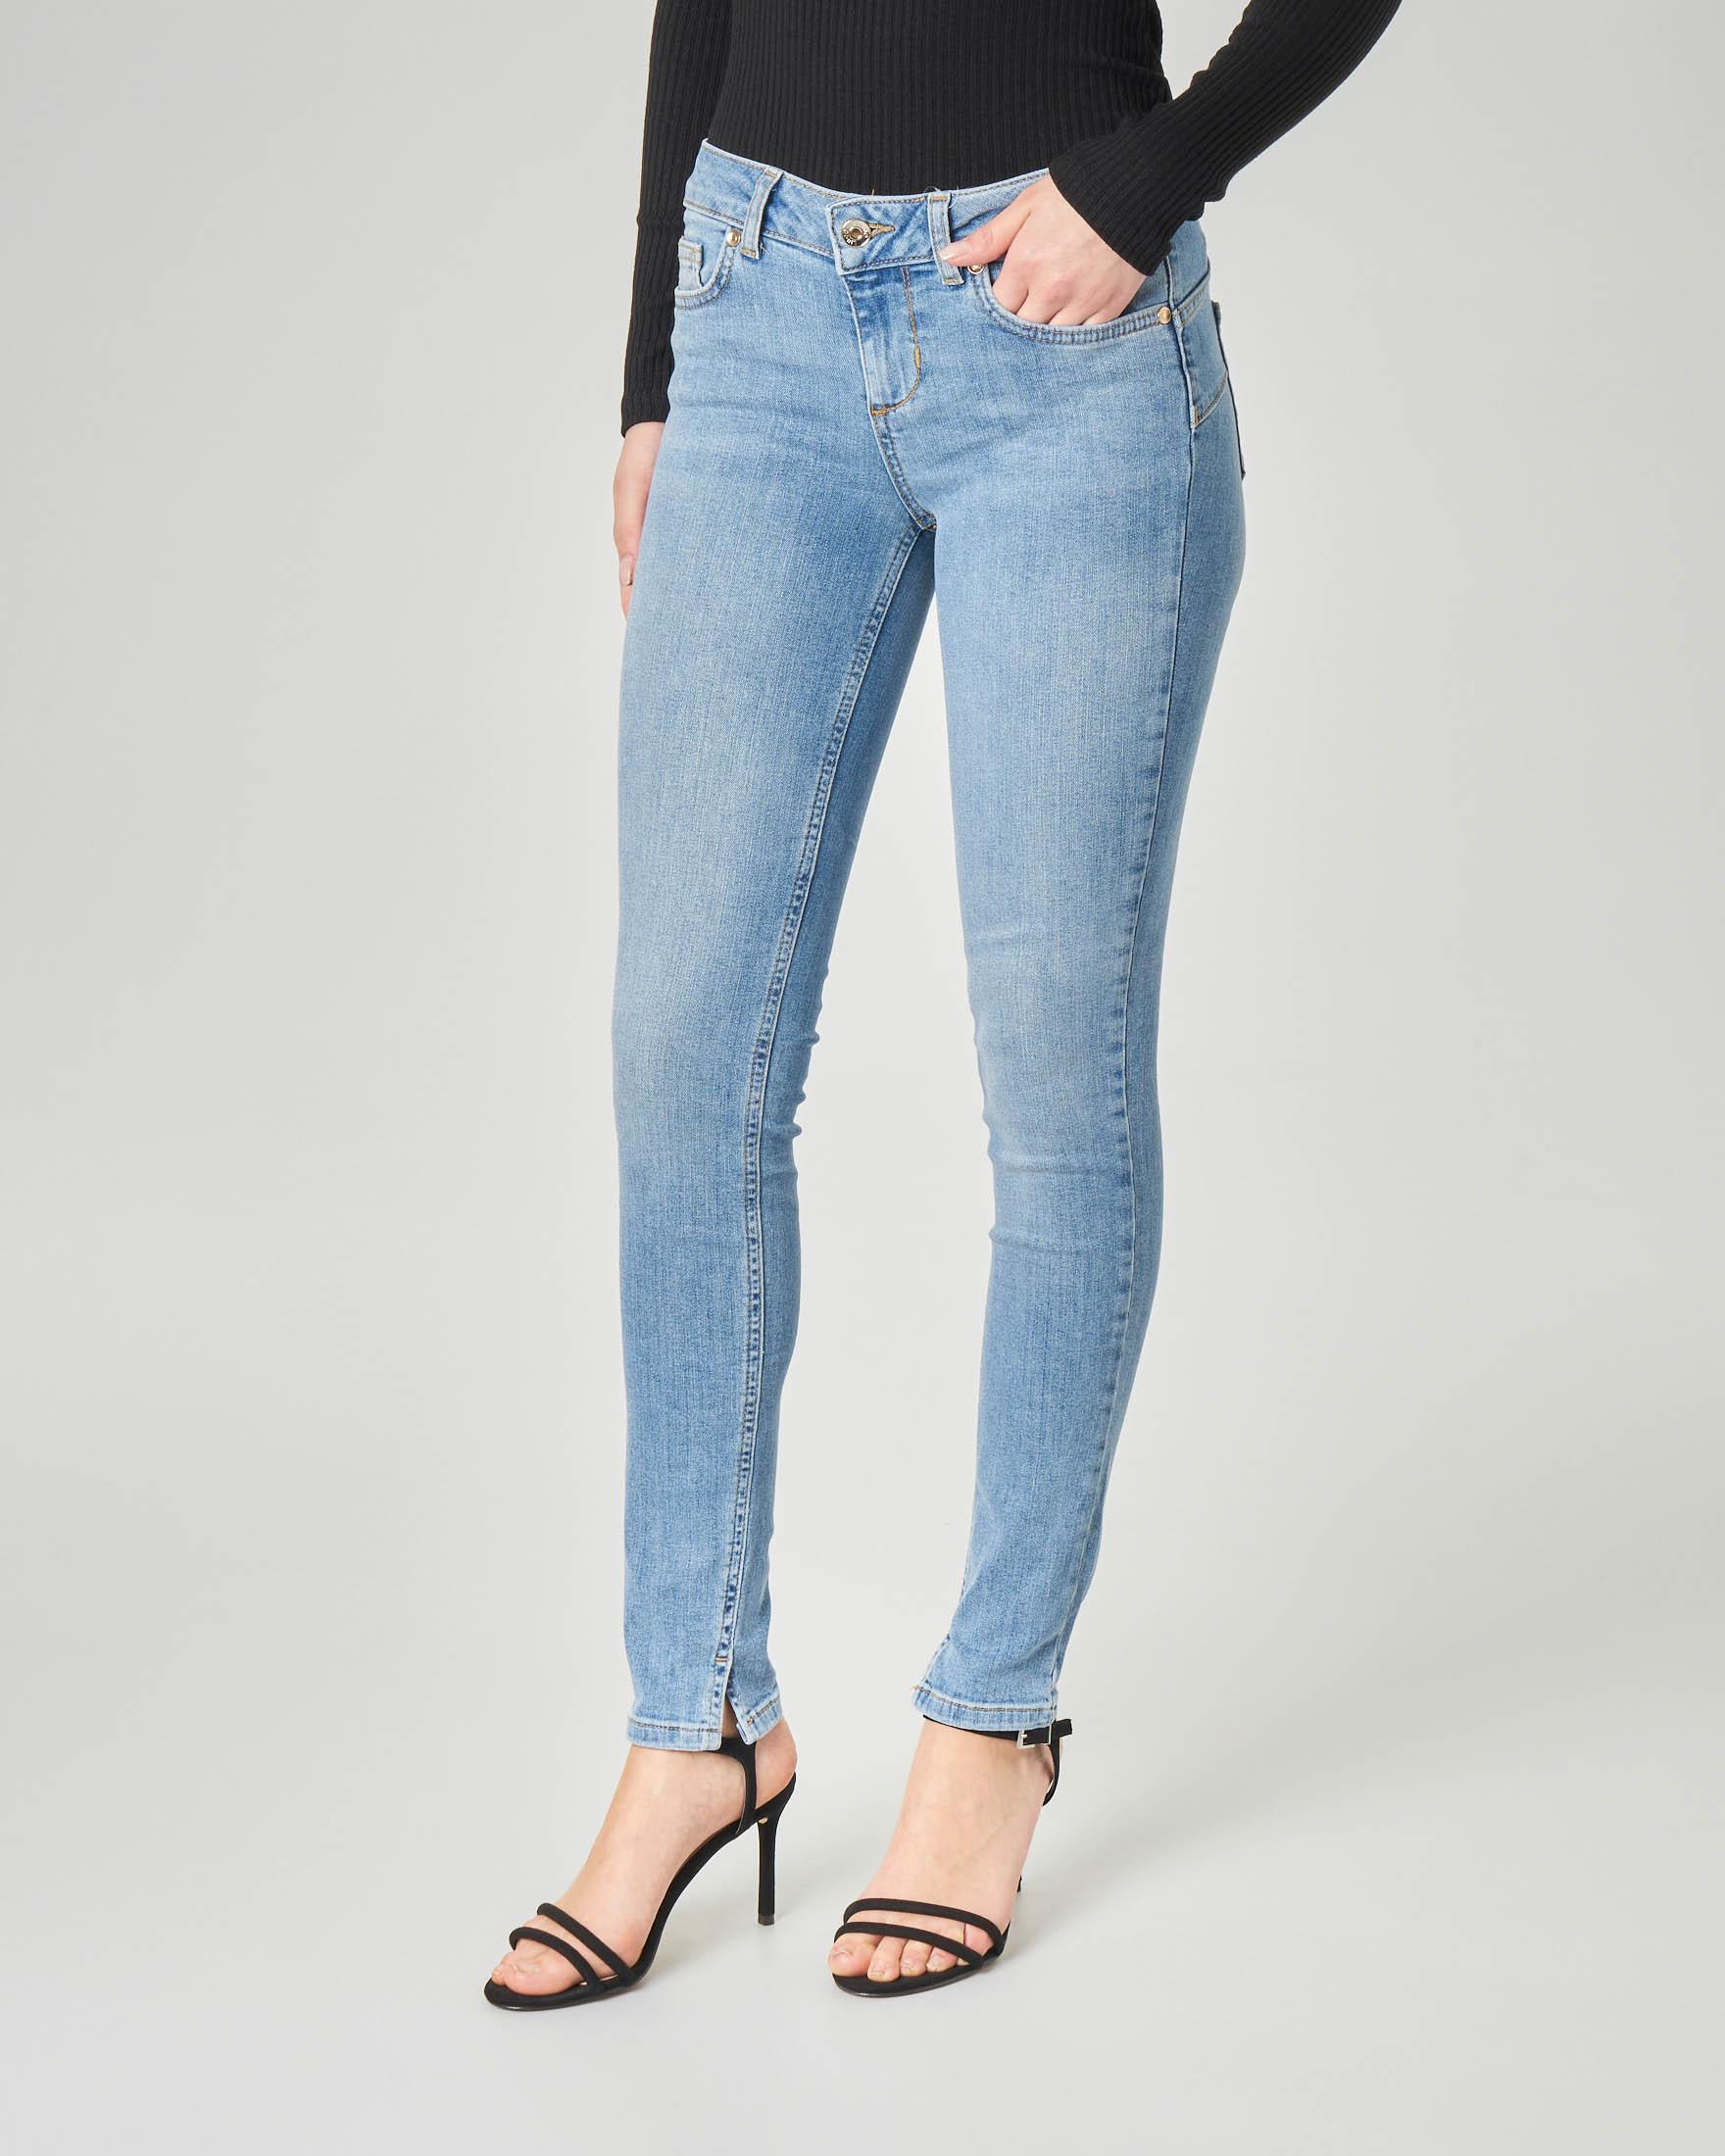 Jeans skinny blu délavé con spacchetti sul fondo